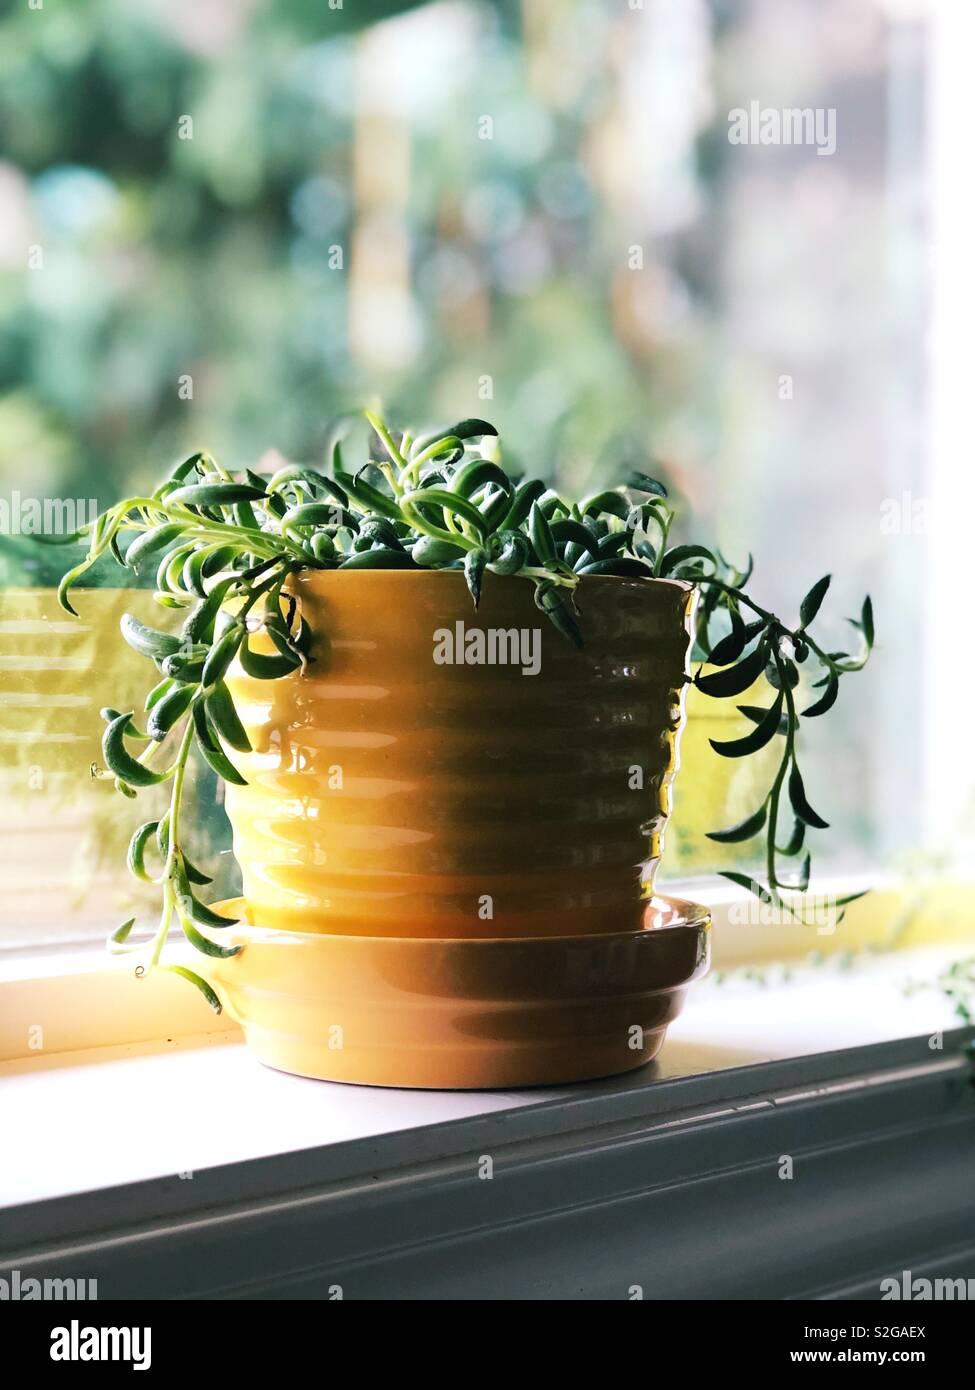 Senecio Radicans, string of bananas plant. - Stock Image